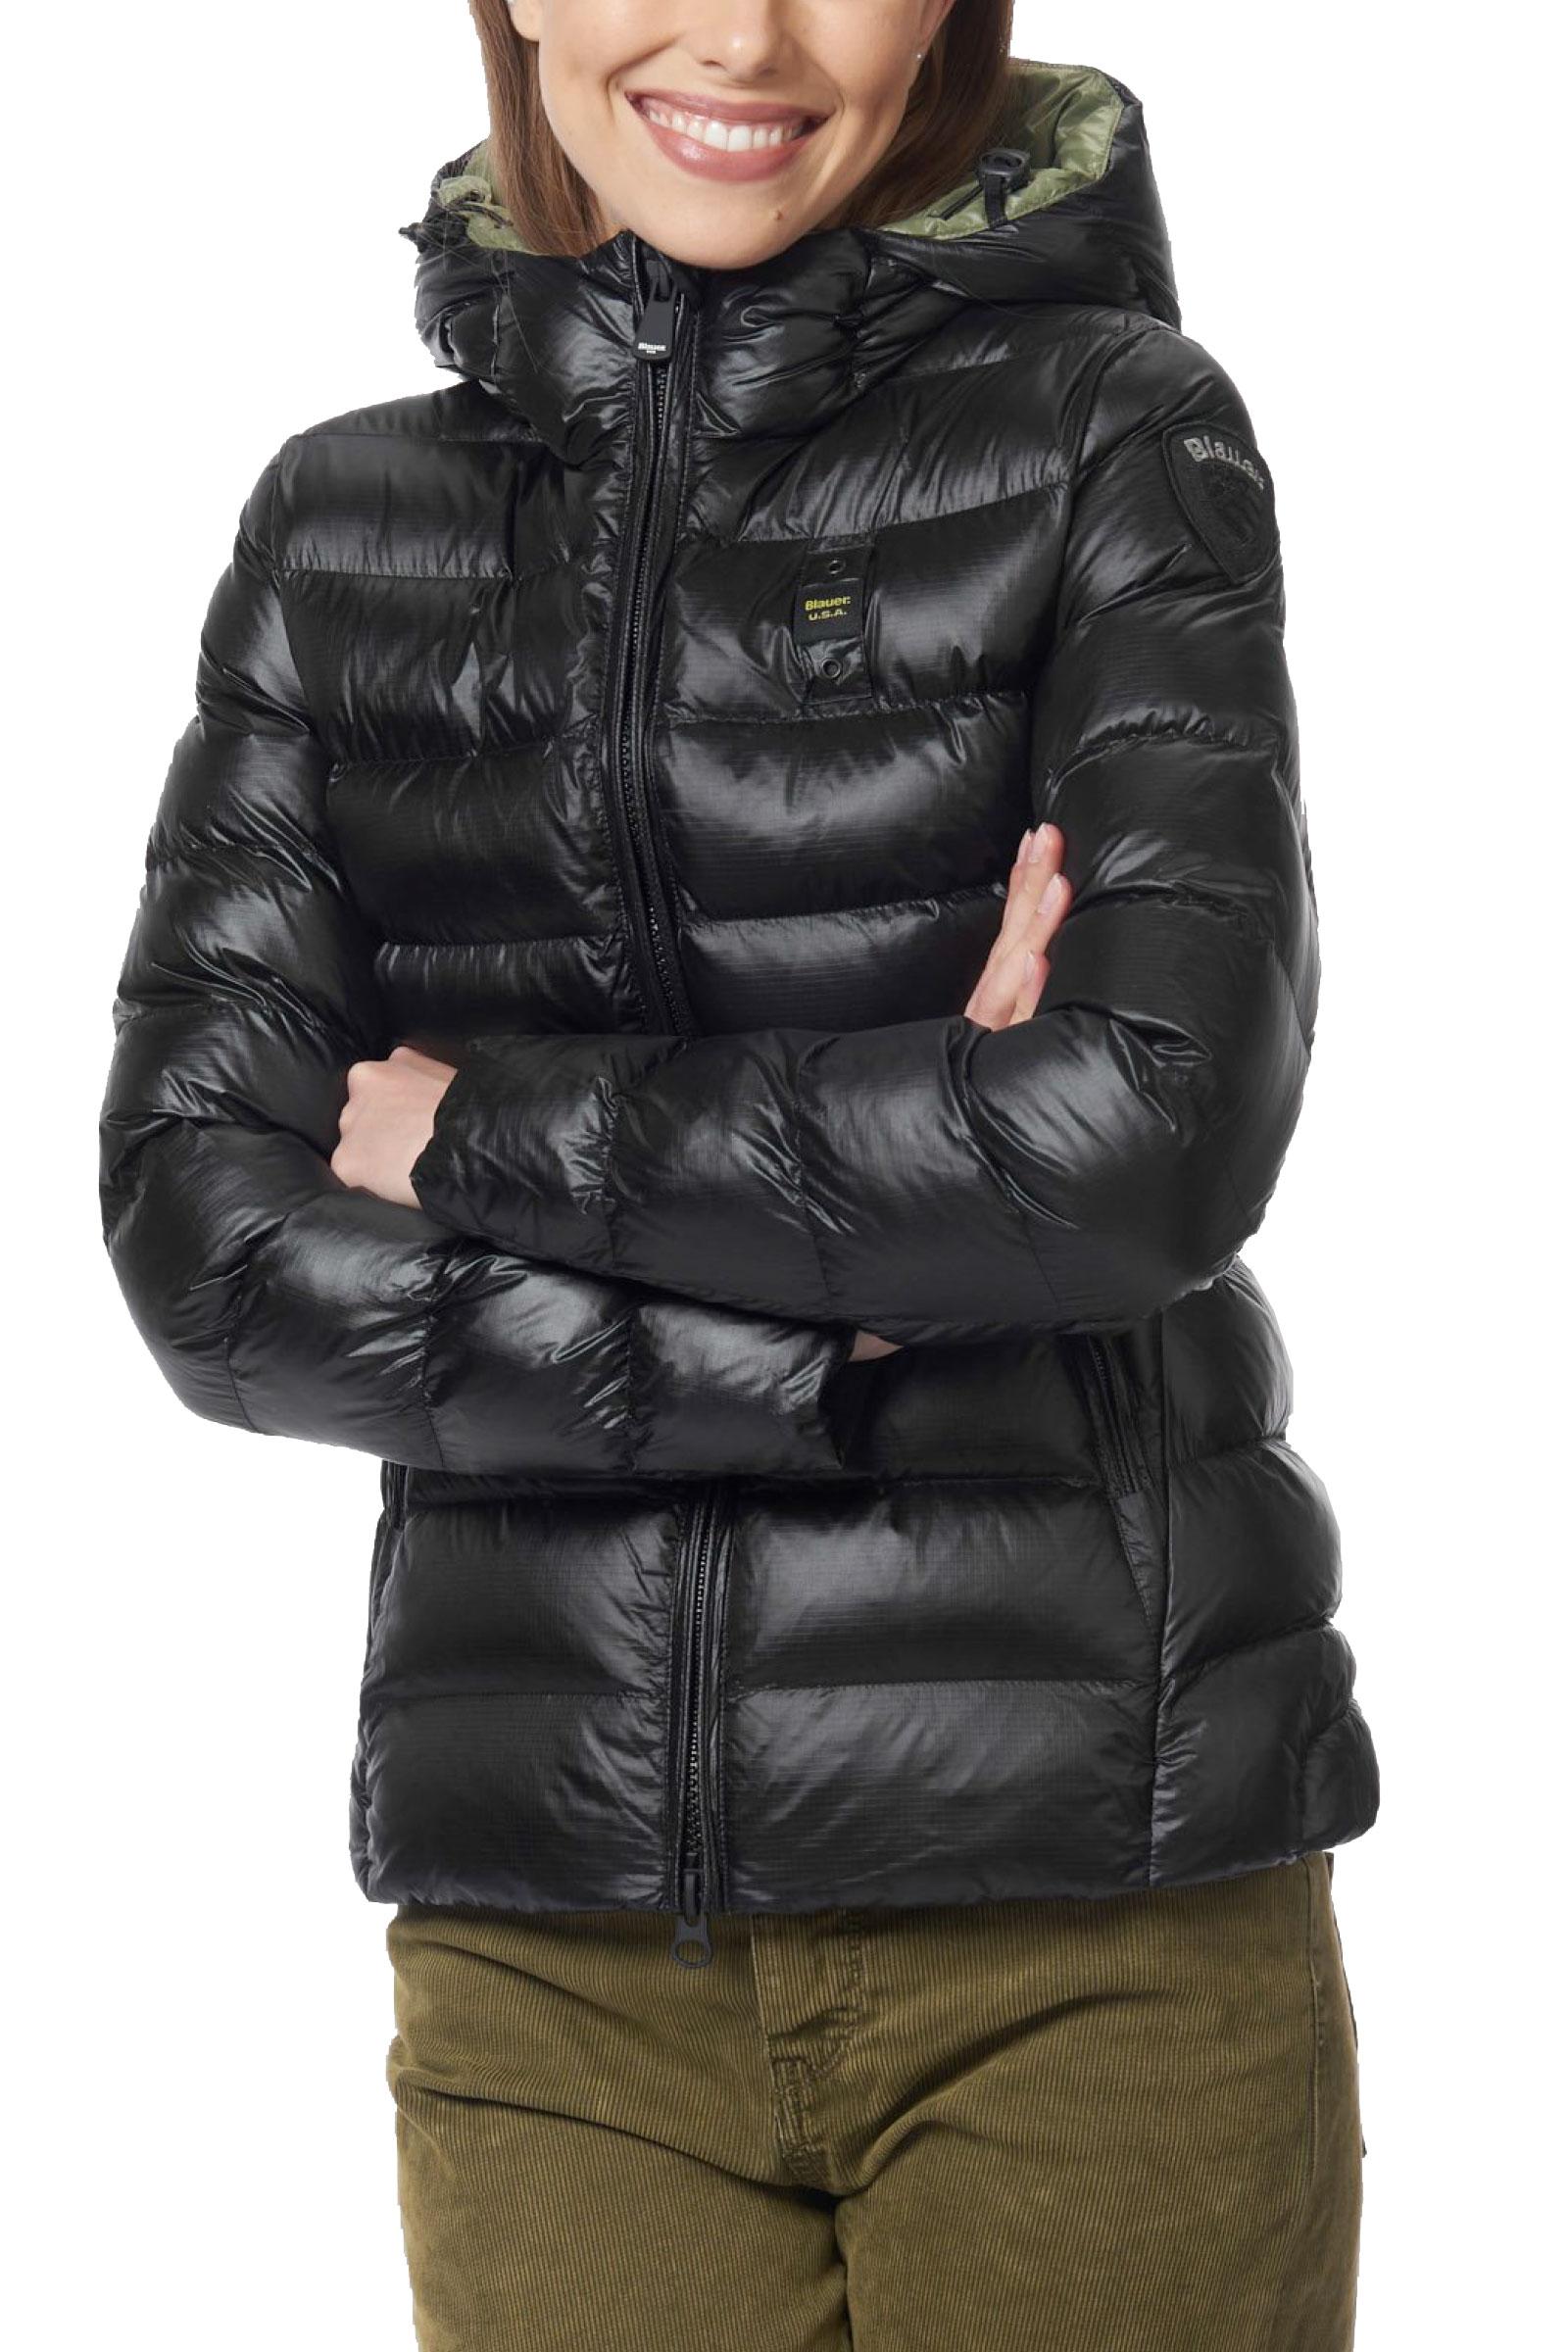 Giubbino Donna Modello Hazel BLAUER | Giubbino | BLDC02125 5958999